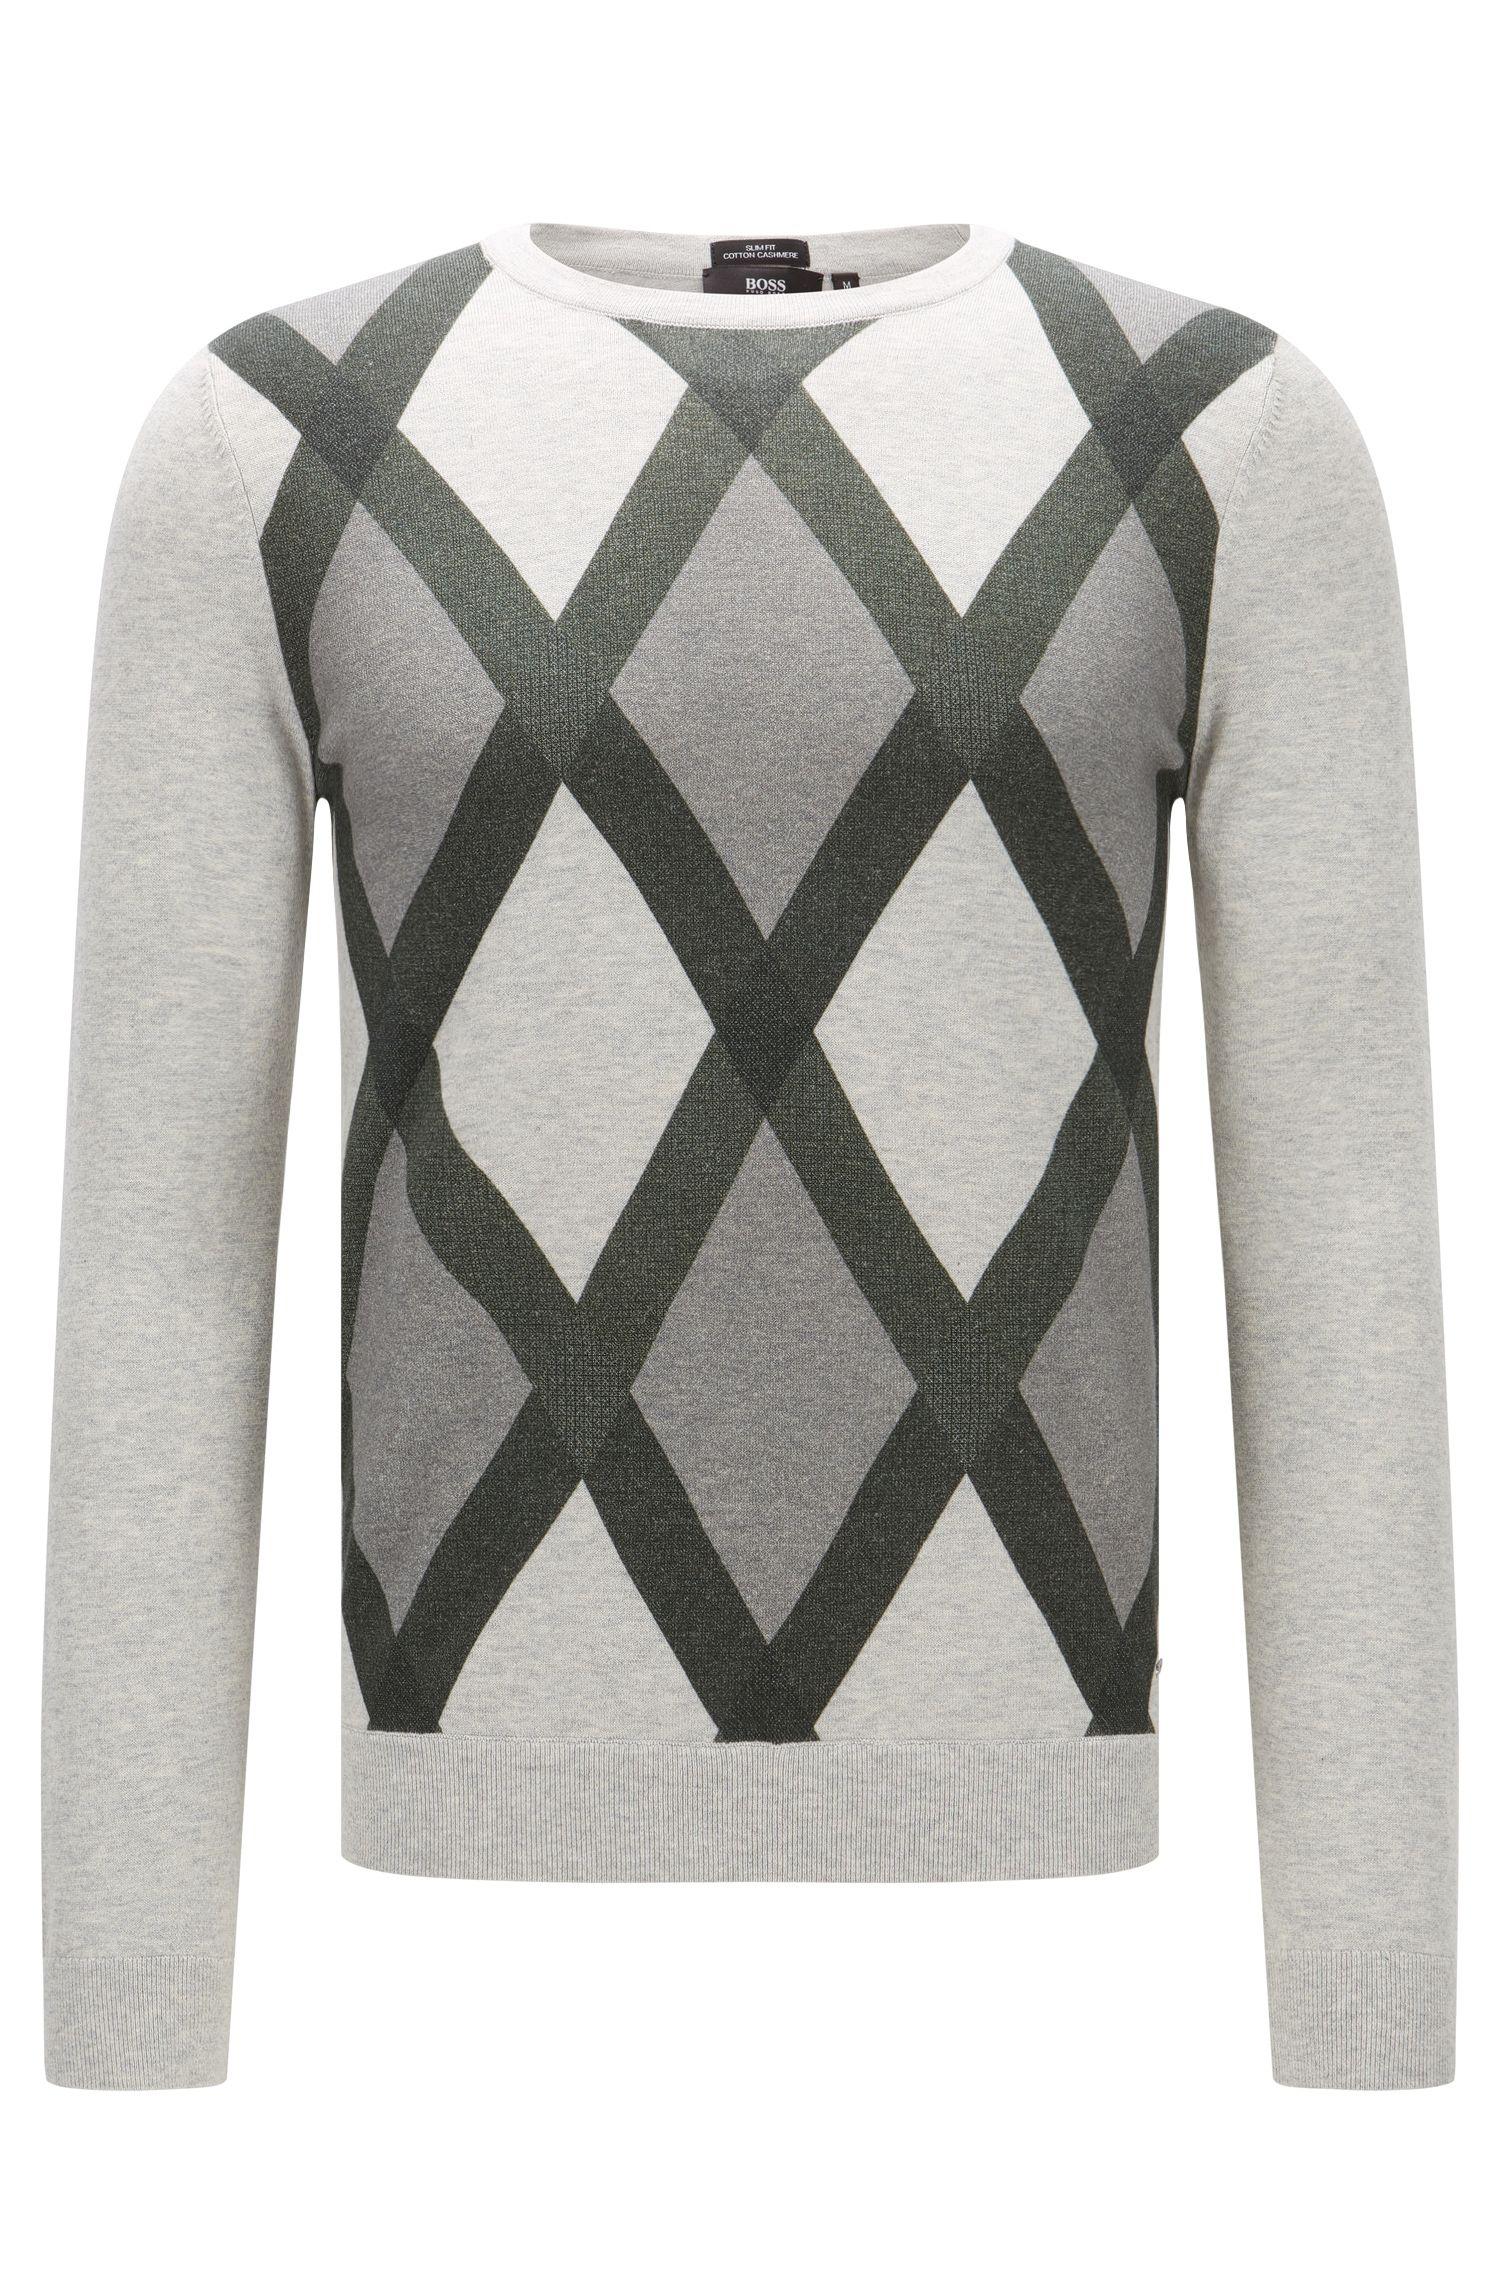 'Niras' | Argyle Cotton Cashmere Sweater